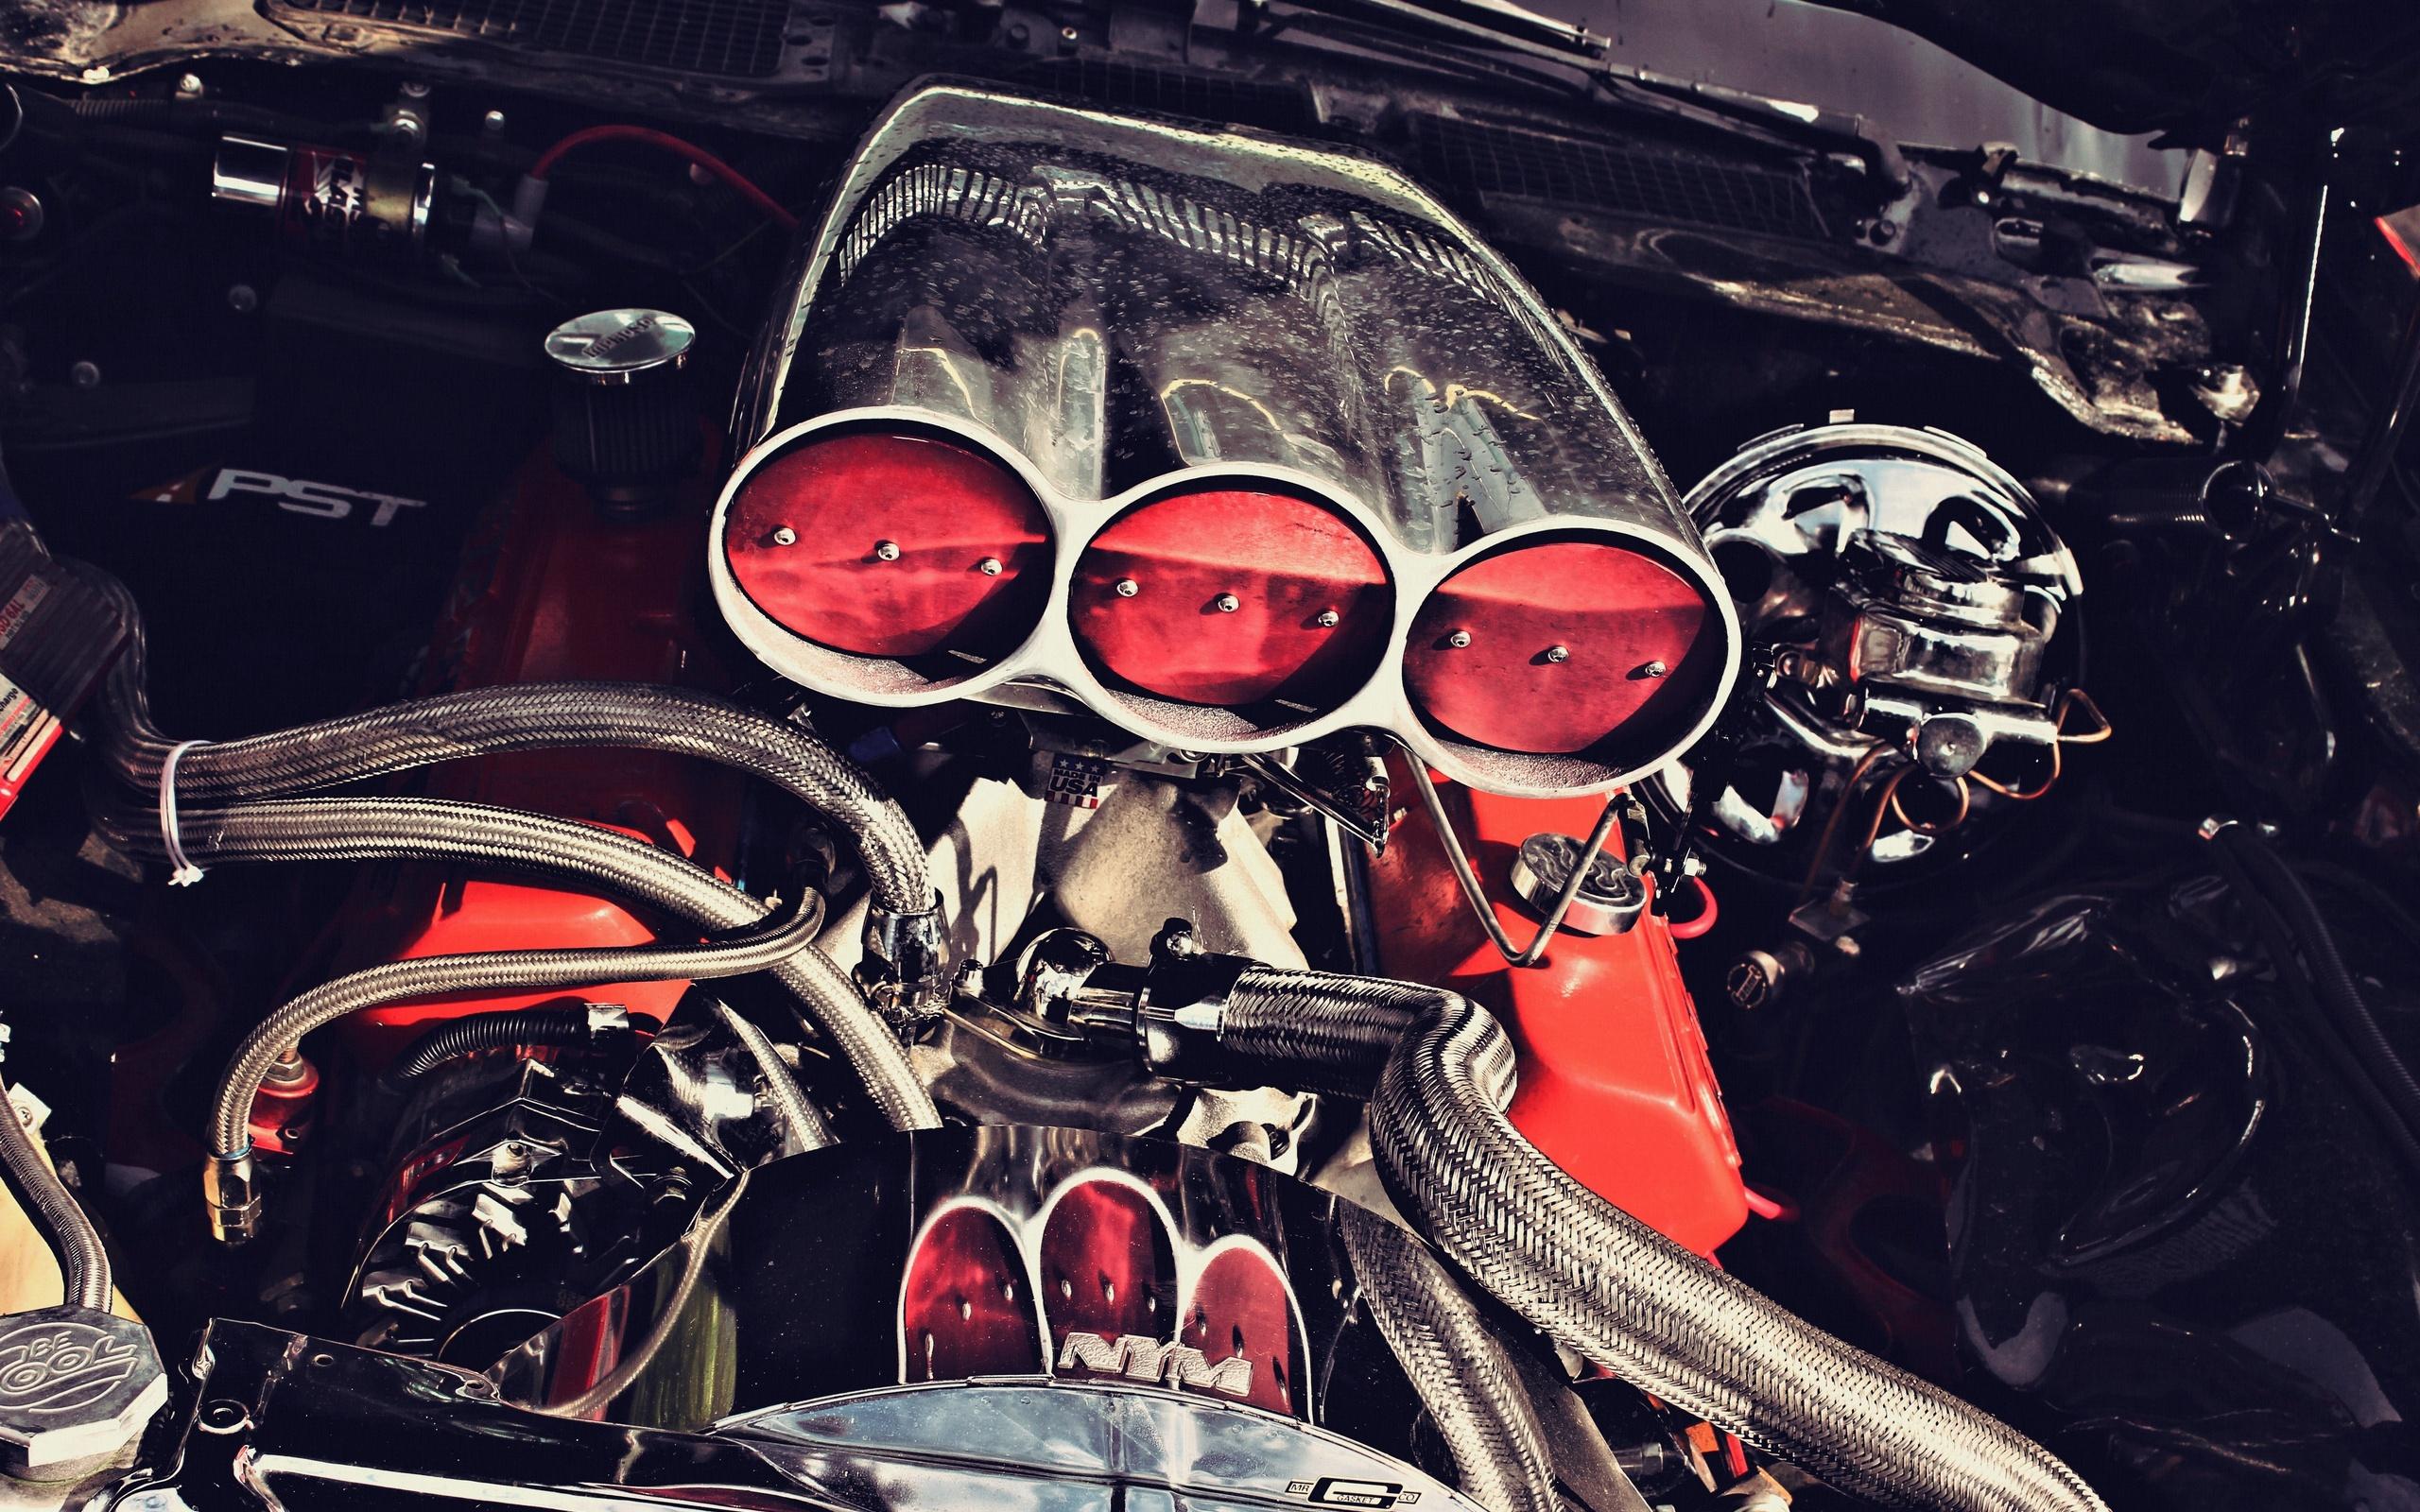 Wallpaper Engine Car 2560x1600 Notjames 1148033 Hd Wallpapers Wallhere